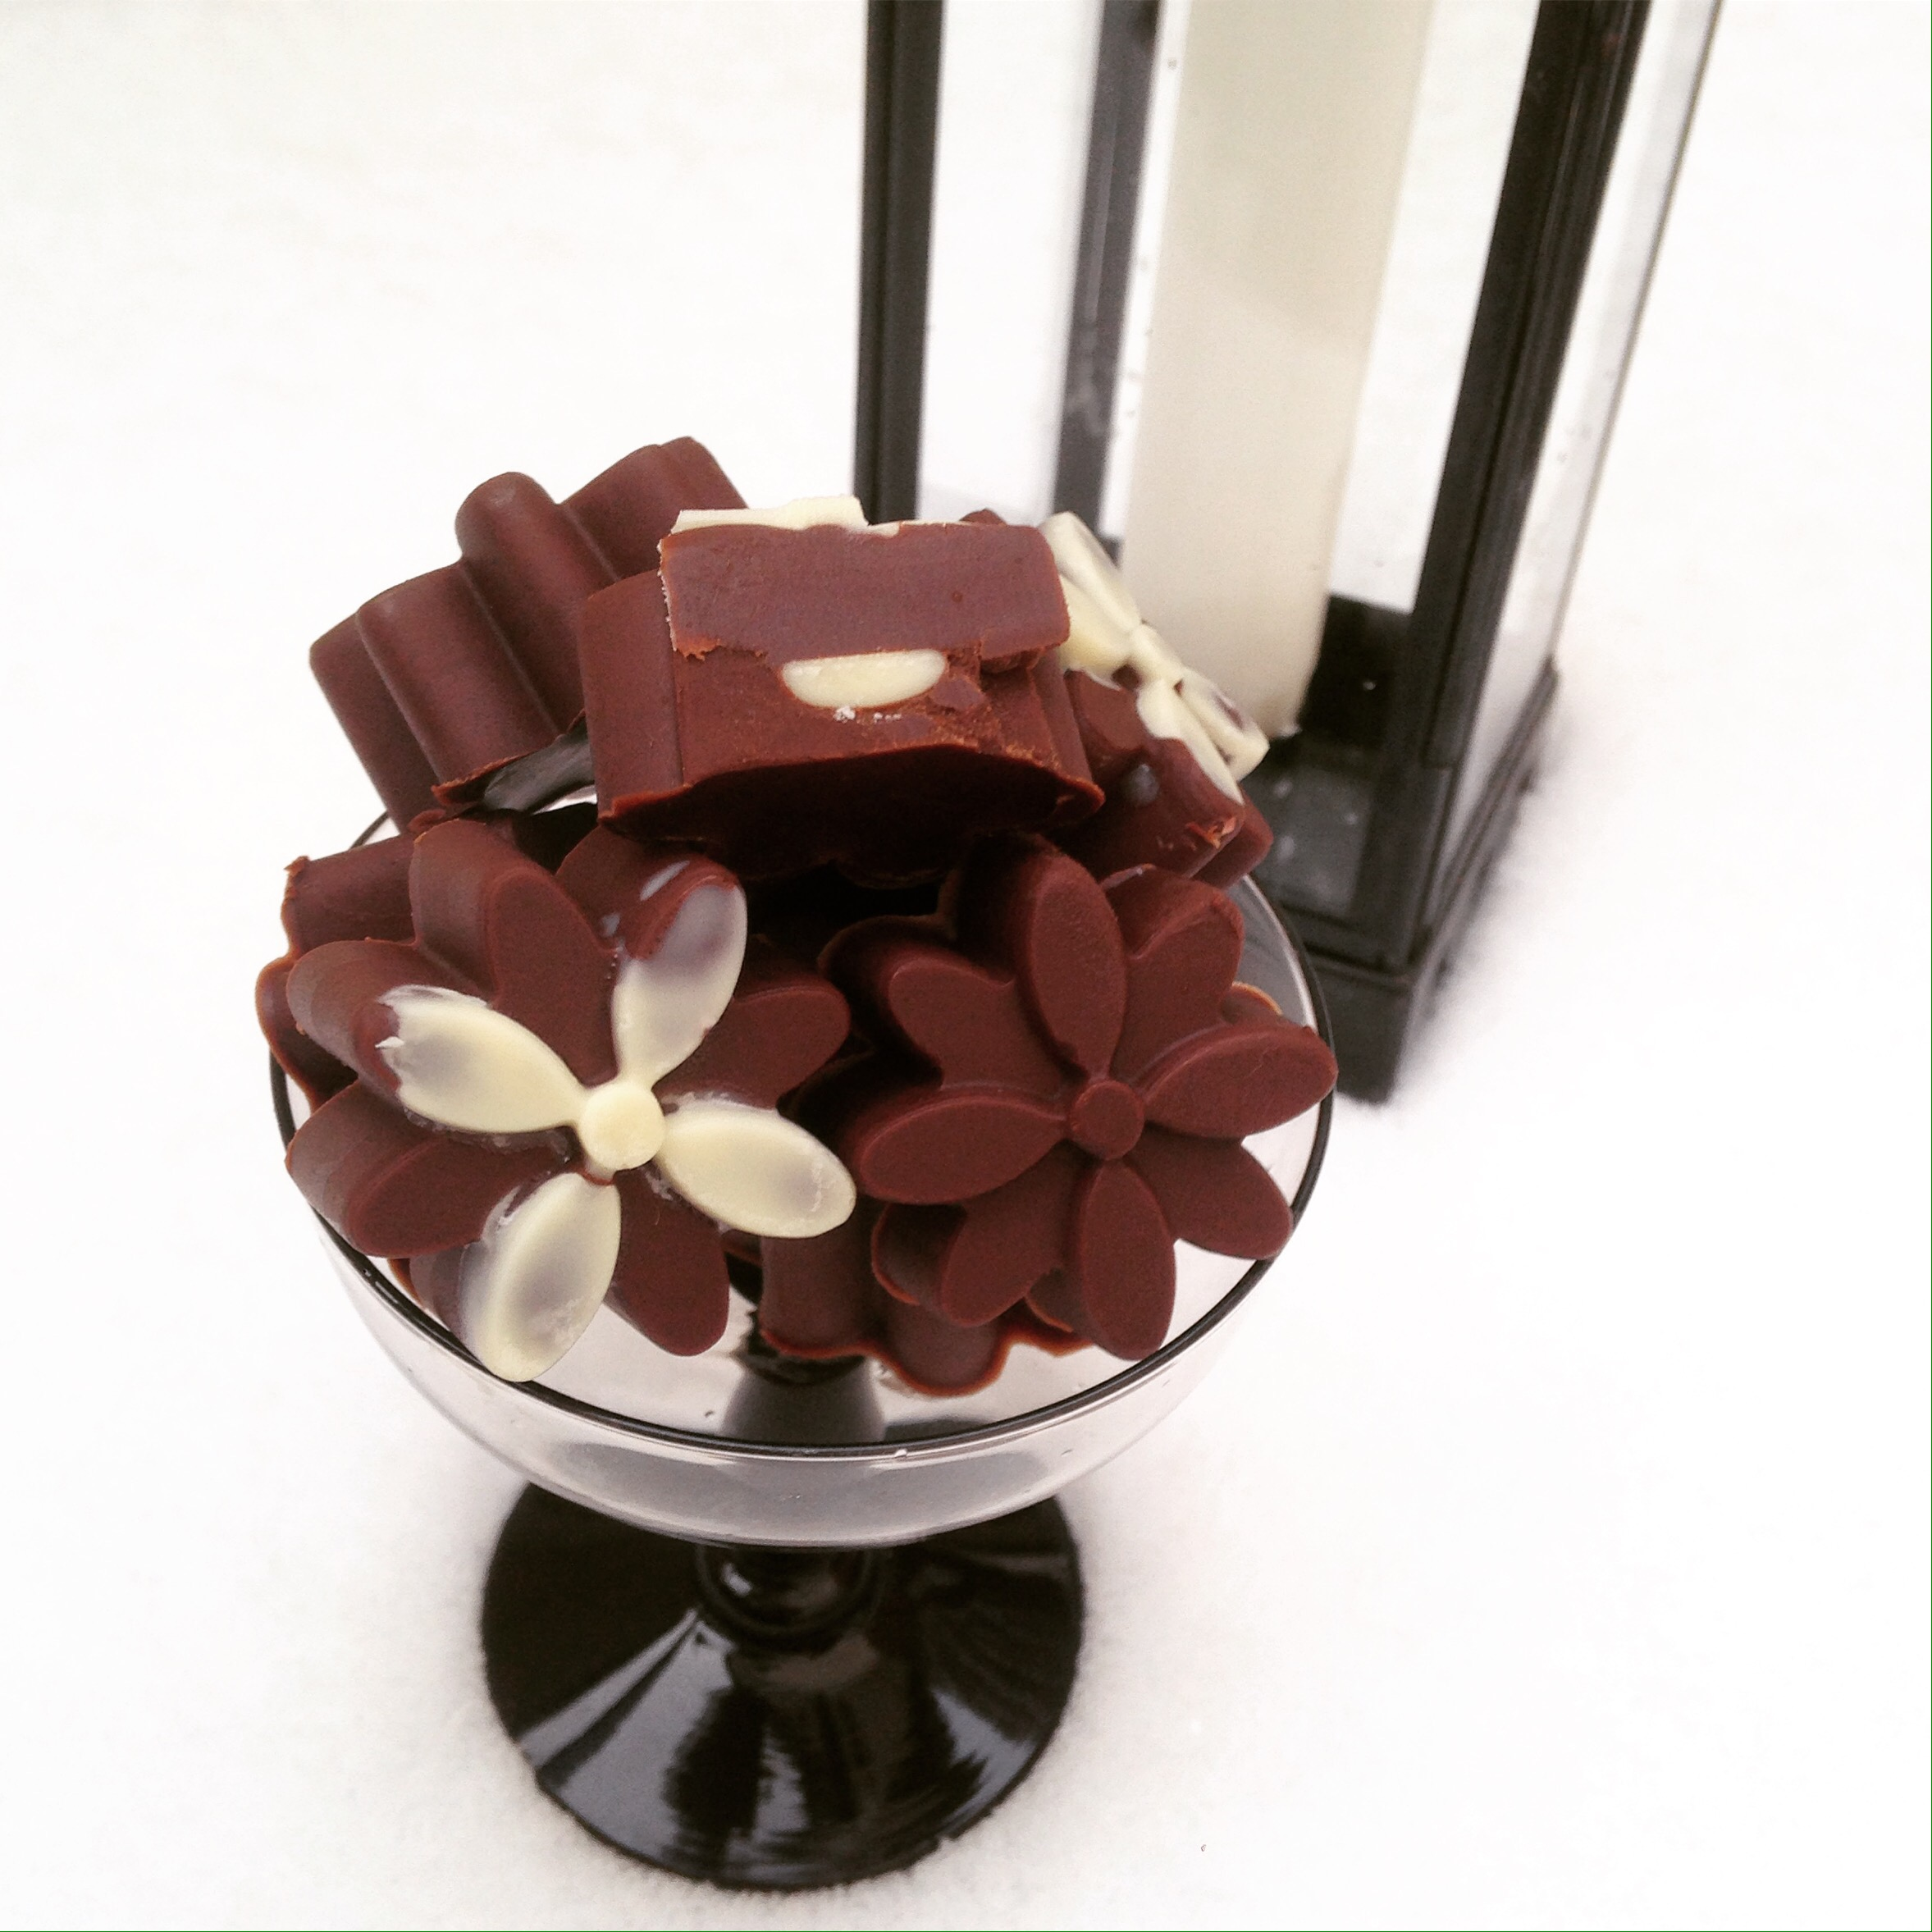 Ischoklad med vit choklad